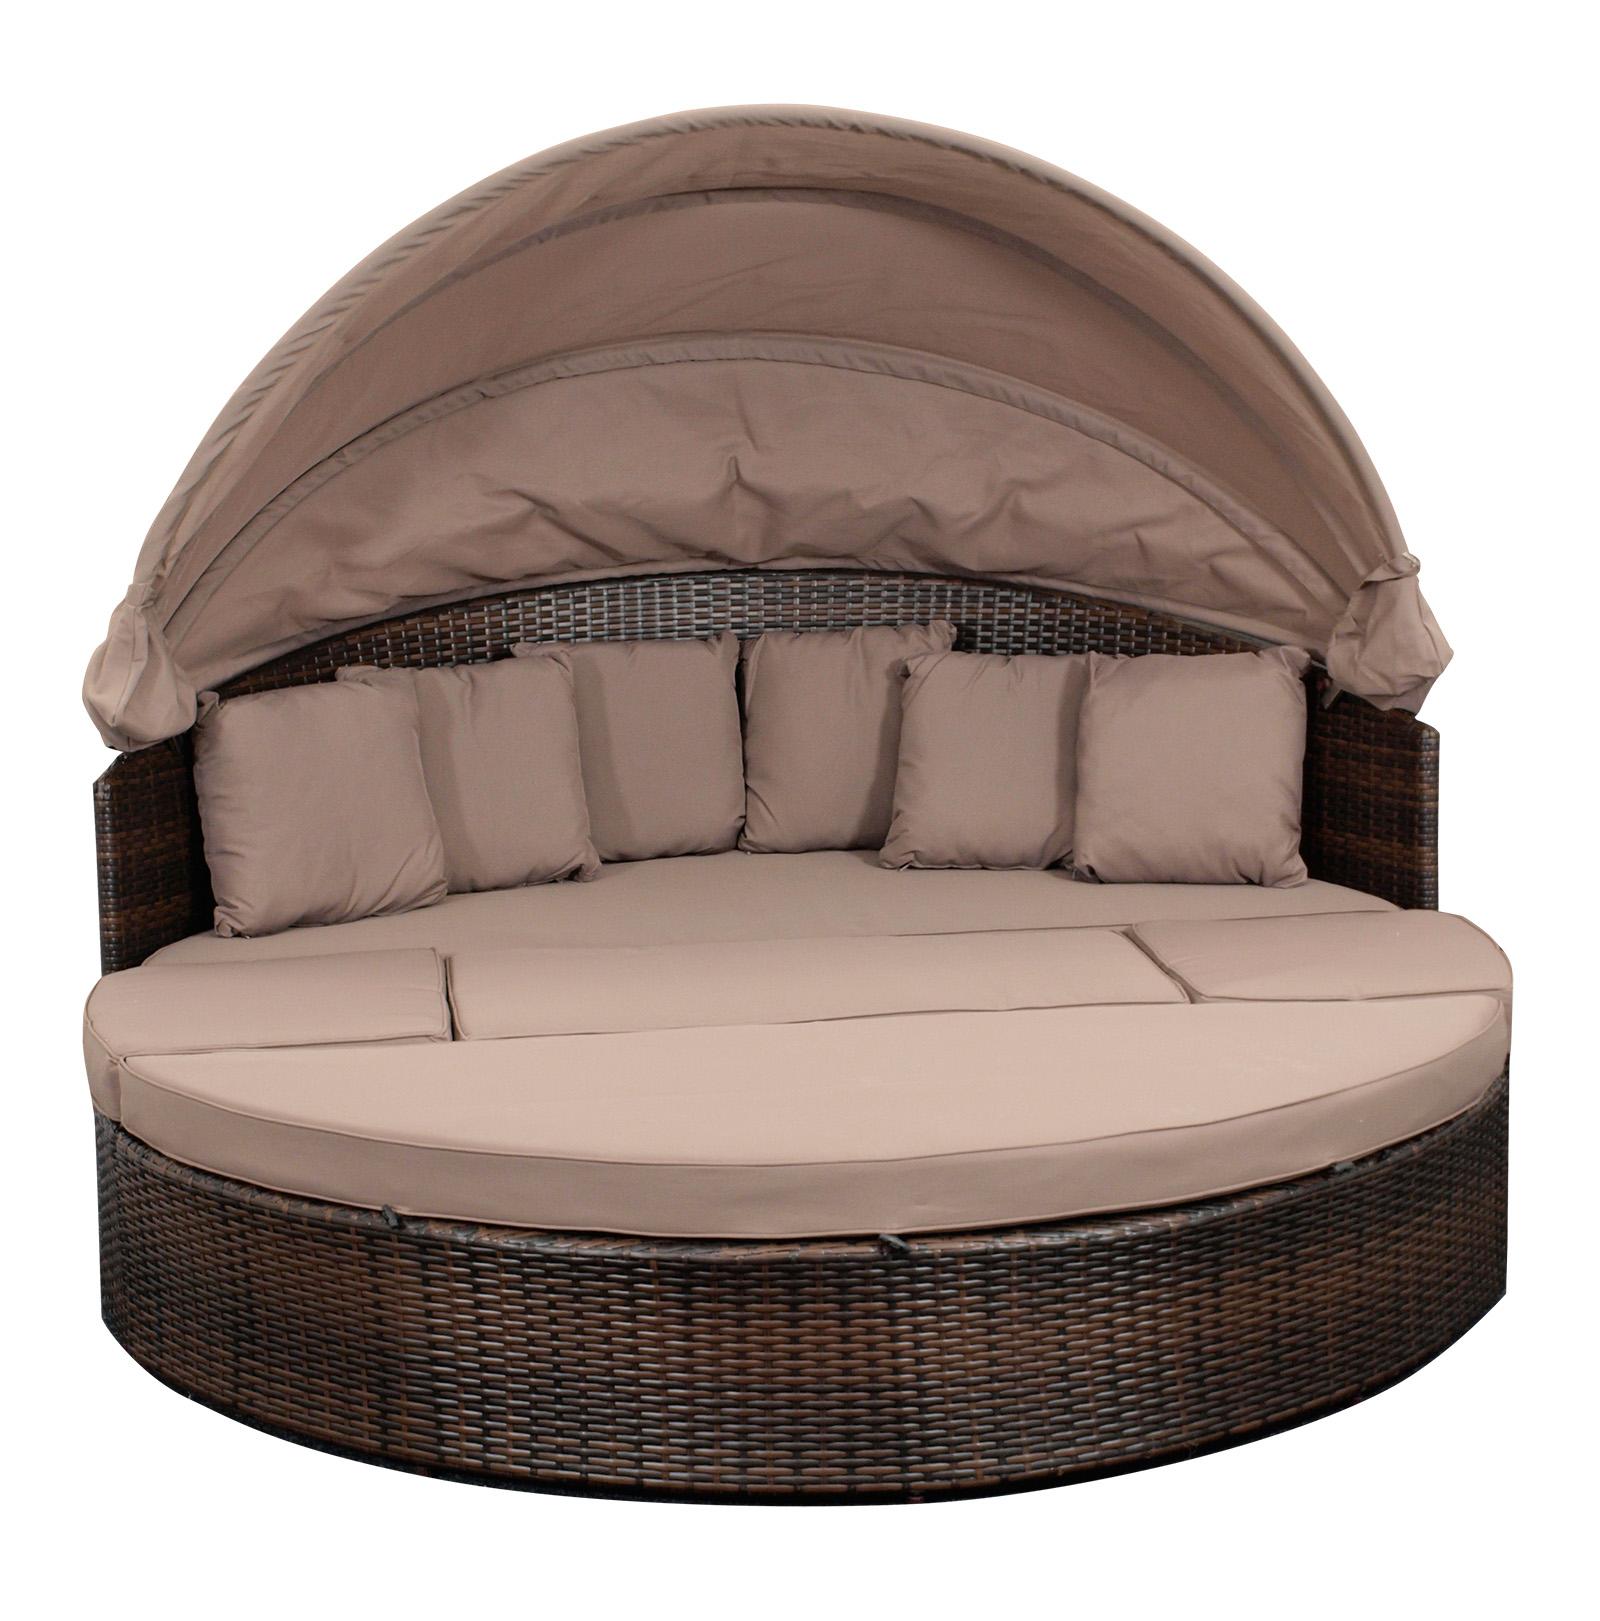 gartenliege gartenm bel liegeinsel liegemuschel liege riva alu rattan 2 wahl ebay. Black Bedroom Furniture Sets. Home Design Ideas